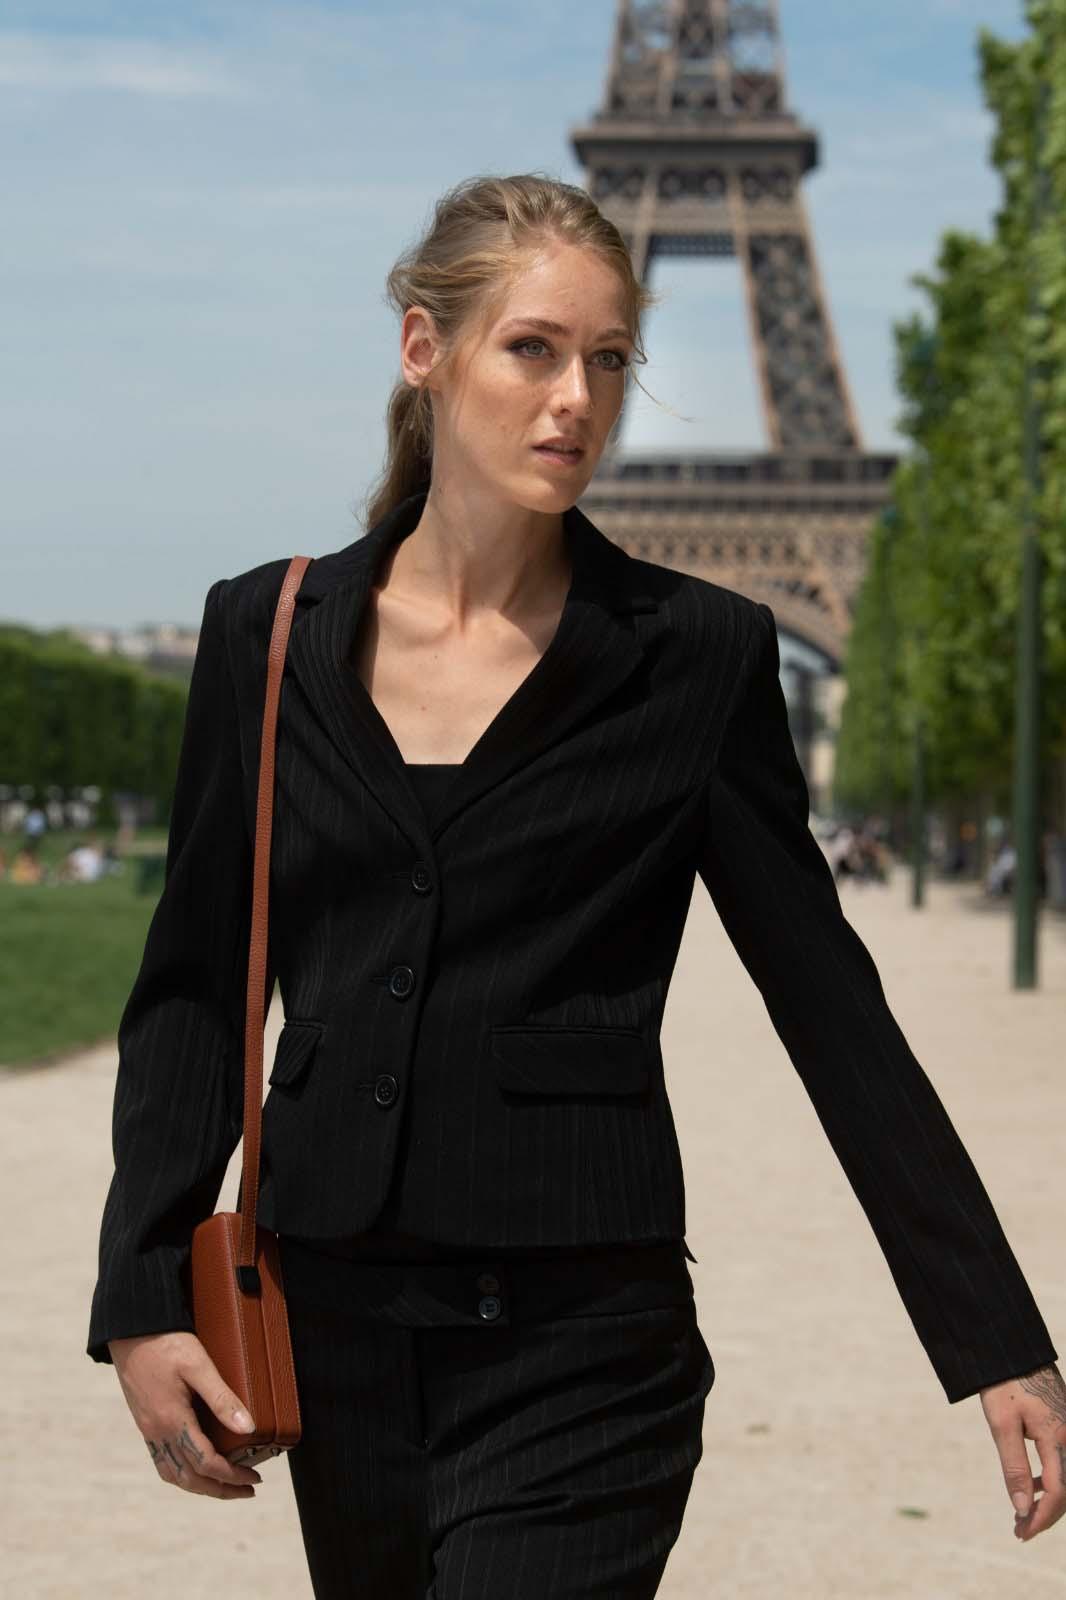 Comissioned for Frau Frieda Handbags 19